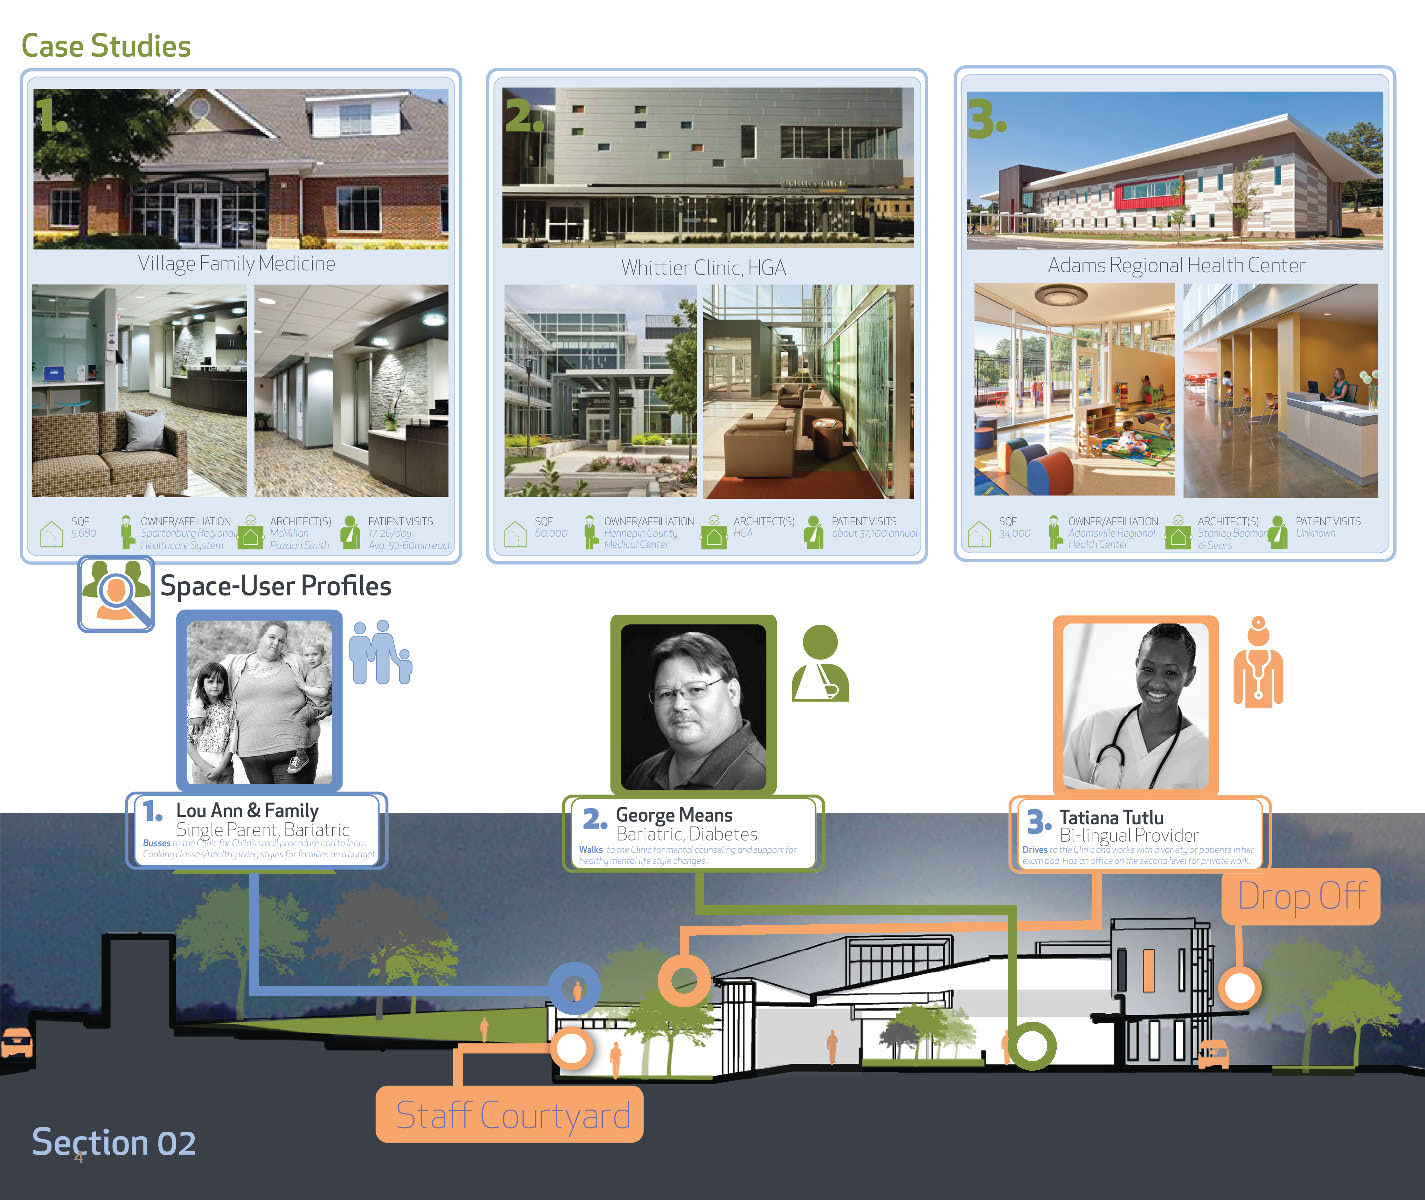 FQHC Studio Project_MCGOWAN_Page_06.jpg